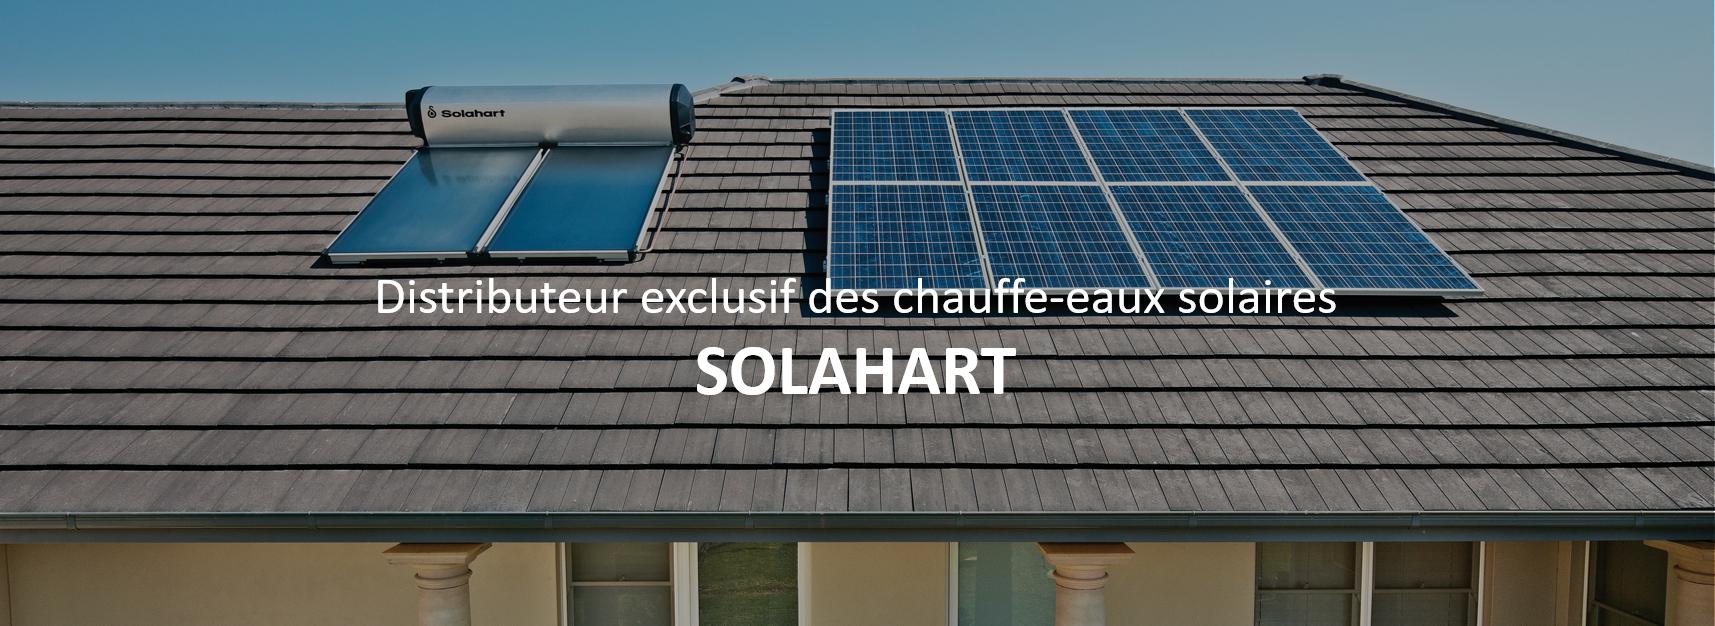 Chauffe-eau solaire سخان المياه الشمسي